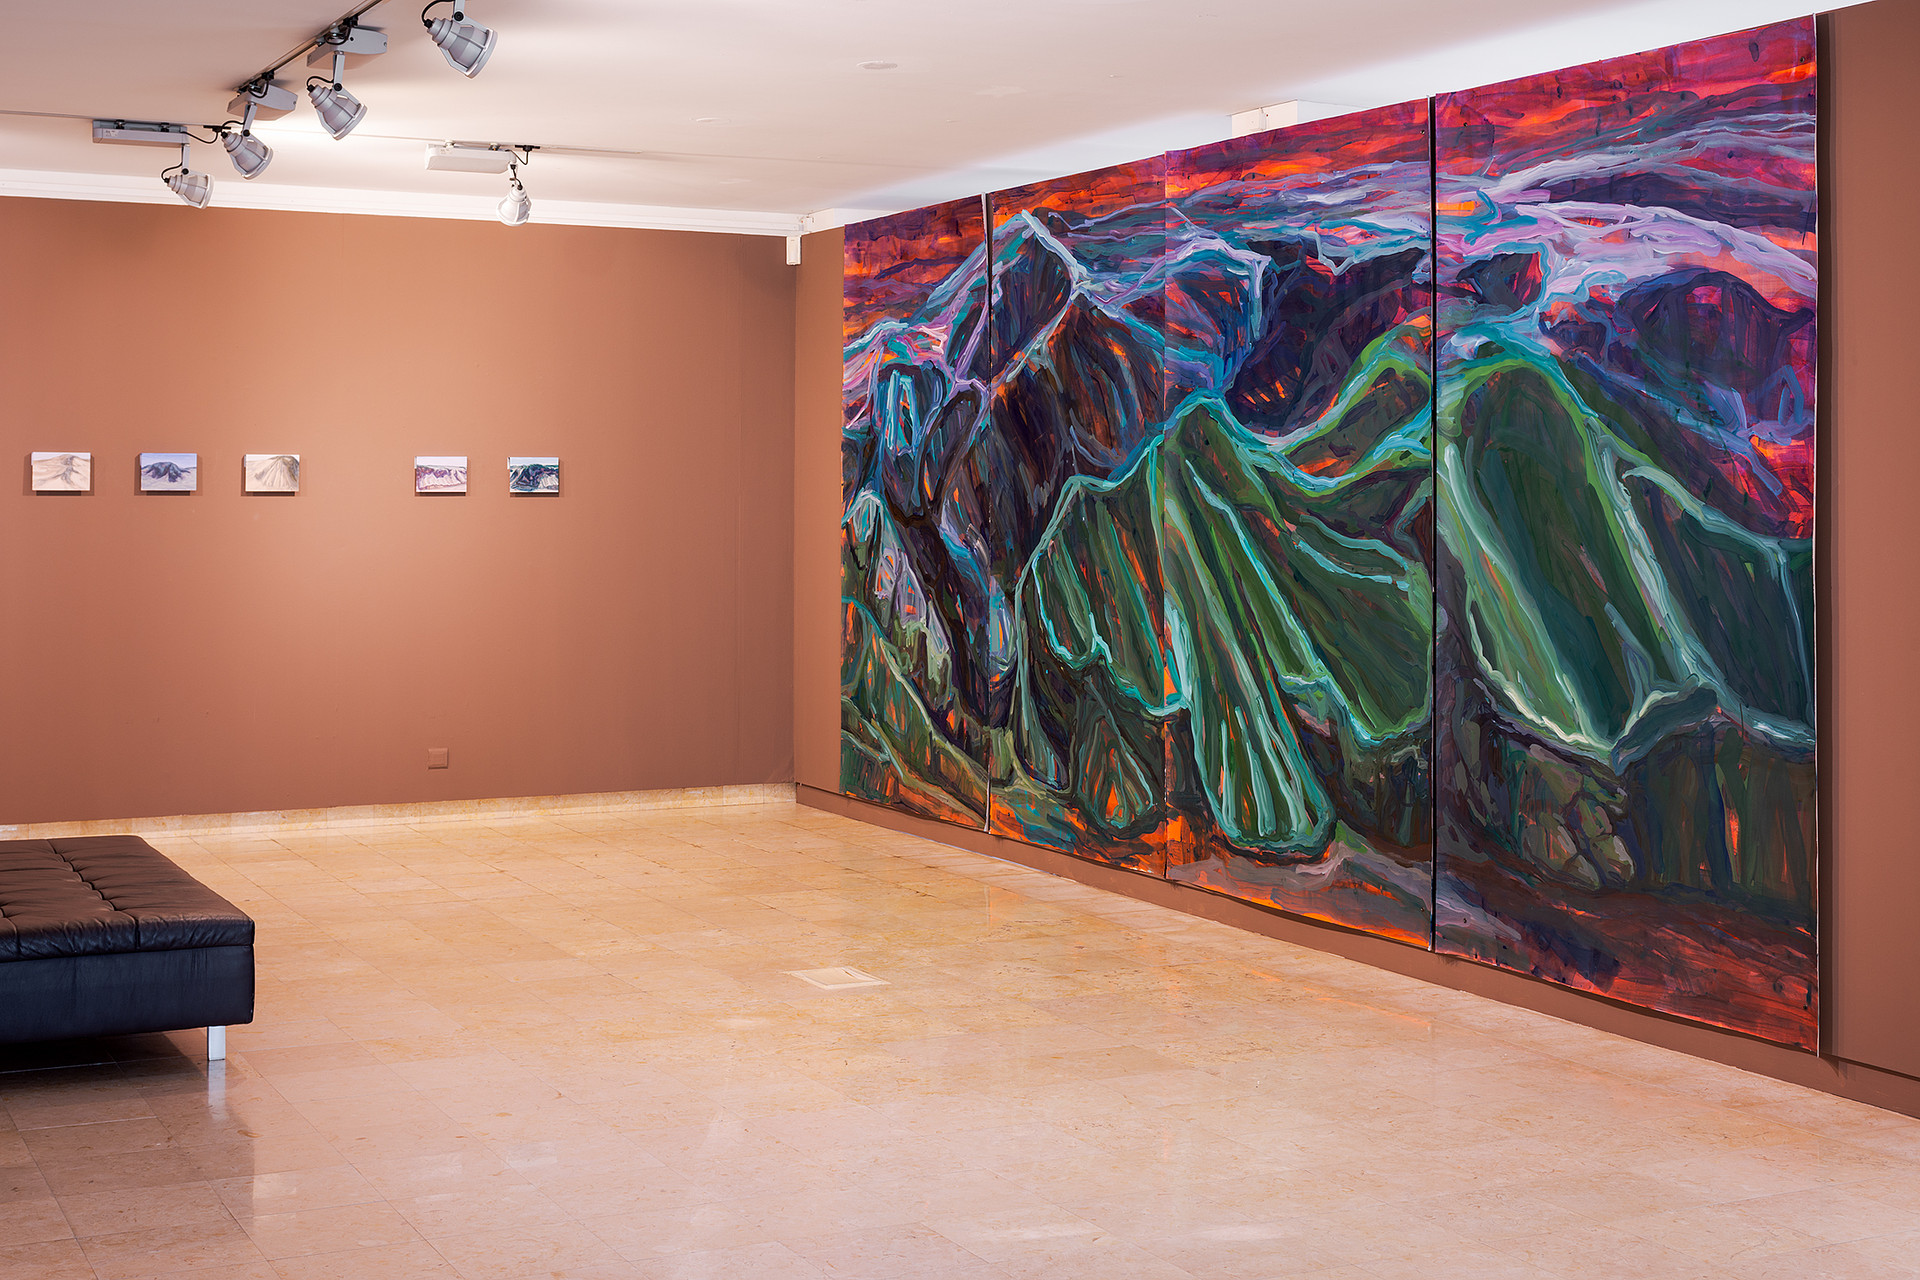 Liquid Sand, acrylic on watercolor paper, 250 x 560 cm. Exhibition view. DMF 2020